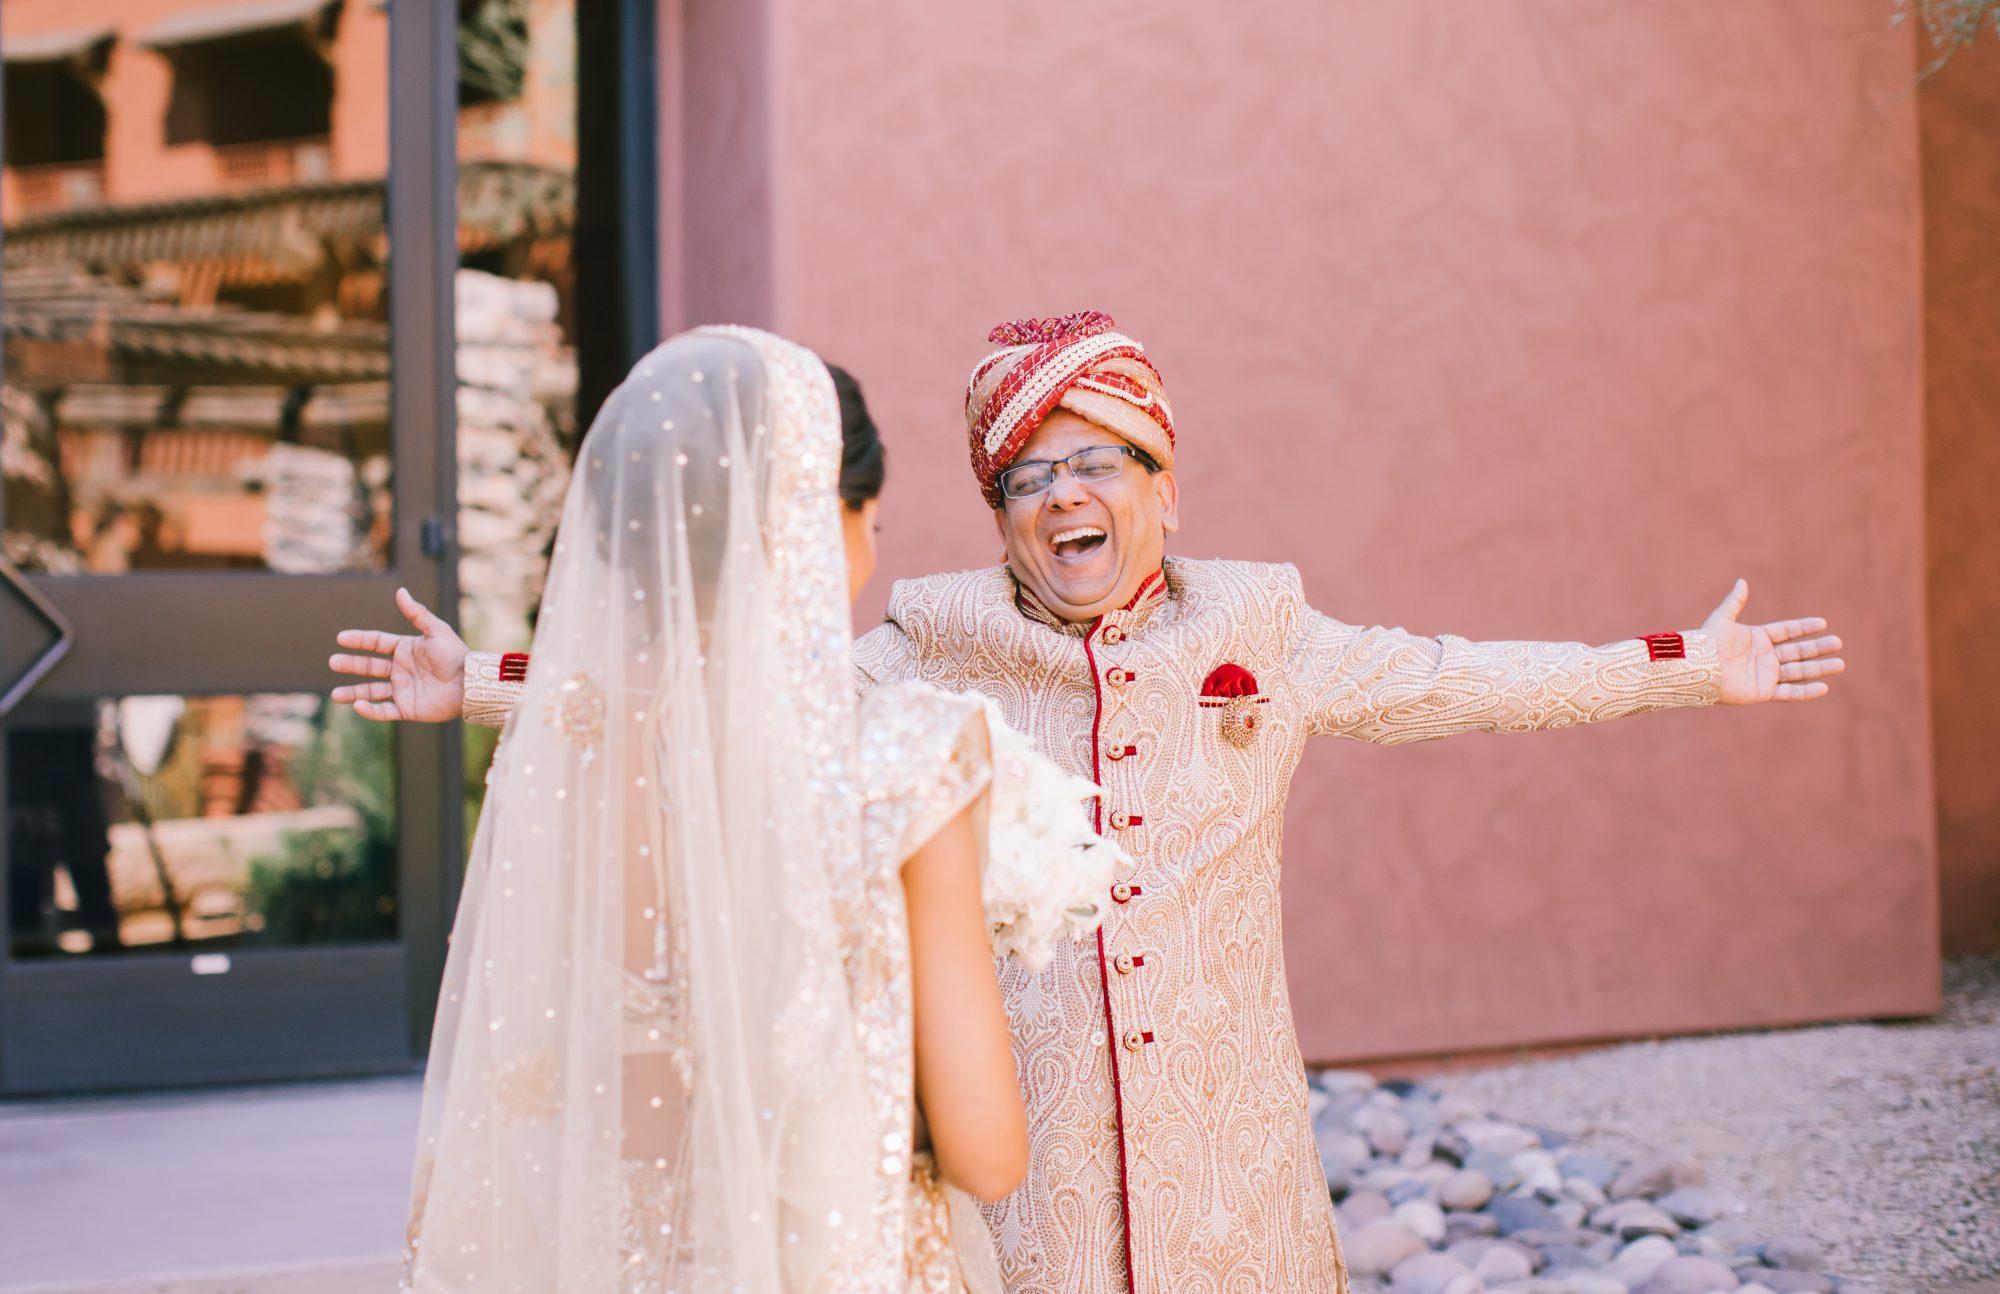 Bride And Groom Recreate Disney S Royal Aladdin With A Grand Elephant Entrance